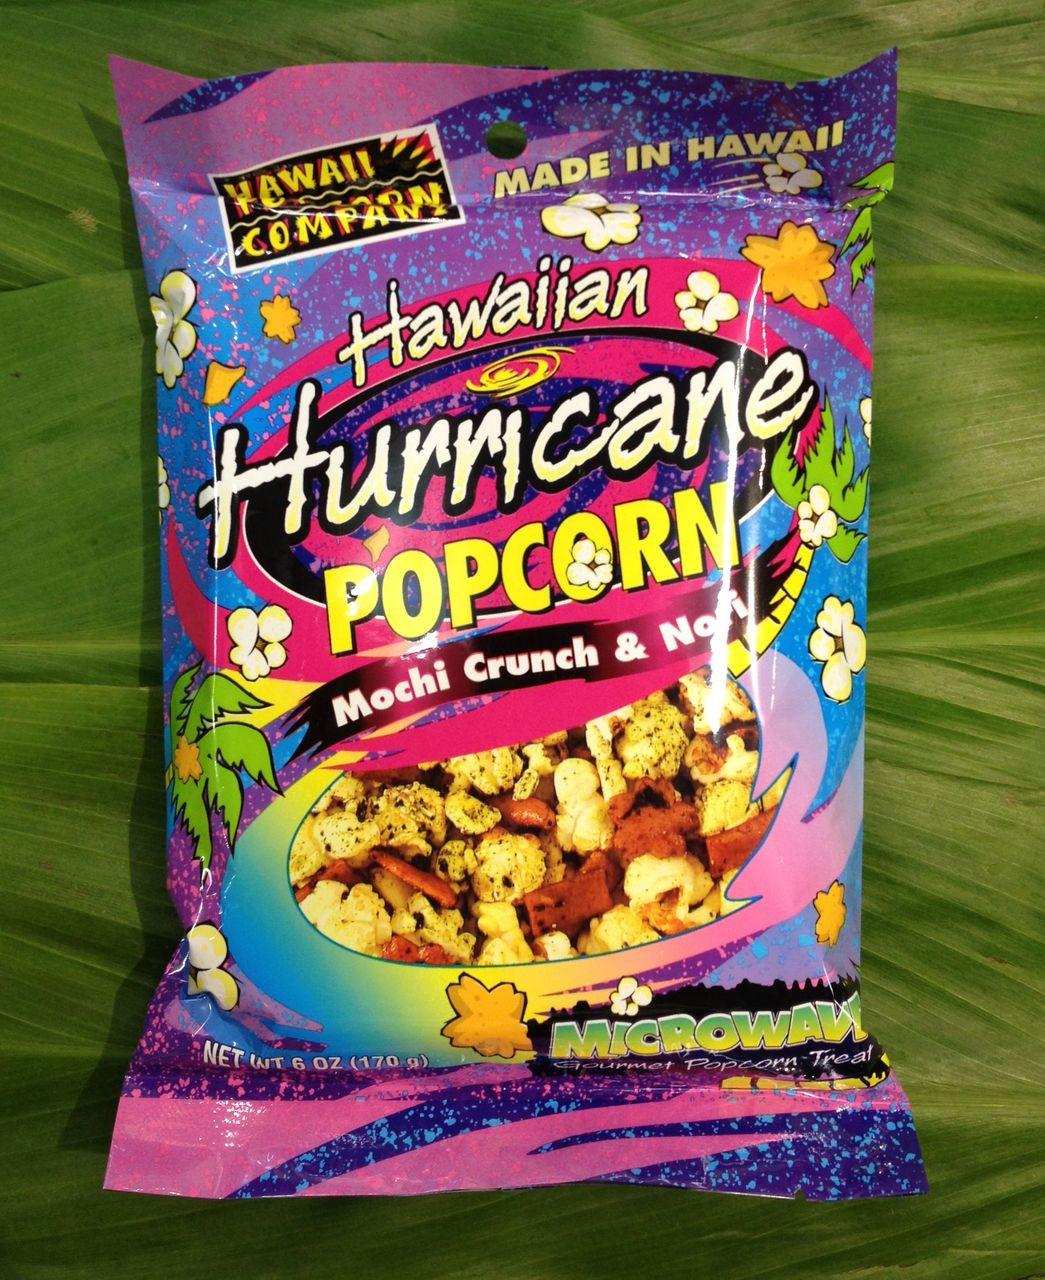 Hawaiian Hurricane Popcorn - Hawaii General Store - HGS Travel